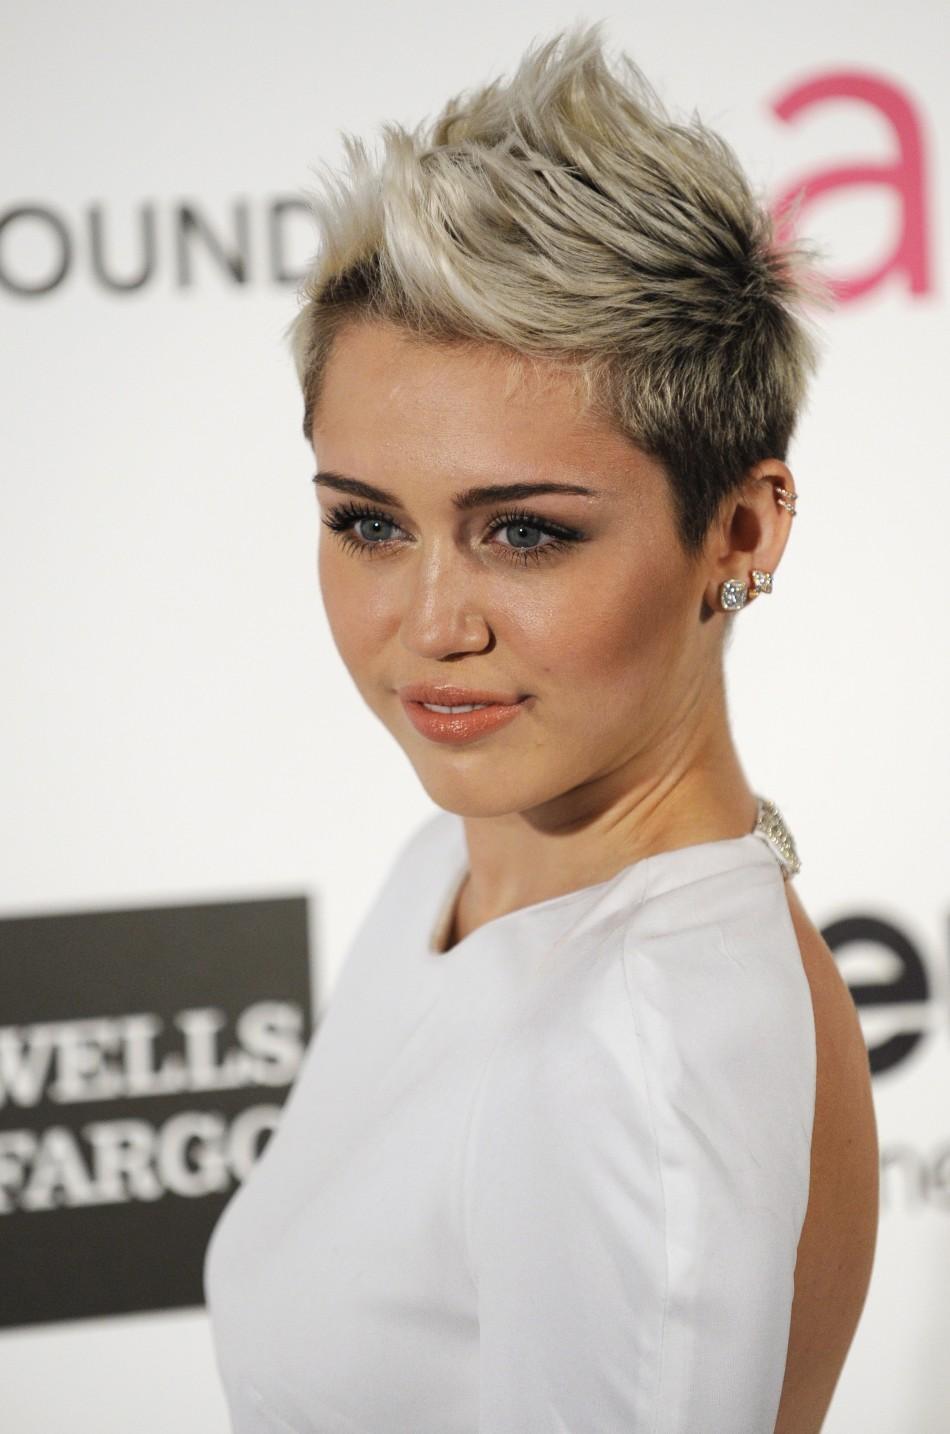 Was Miley Cyrus Smoking Marijuana In Miami